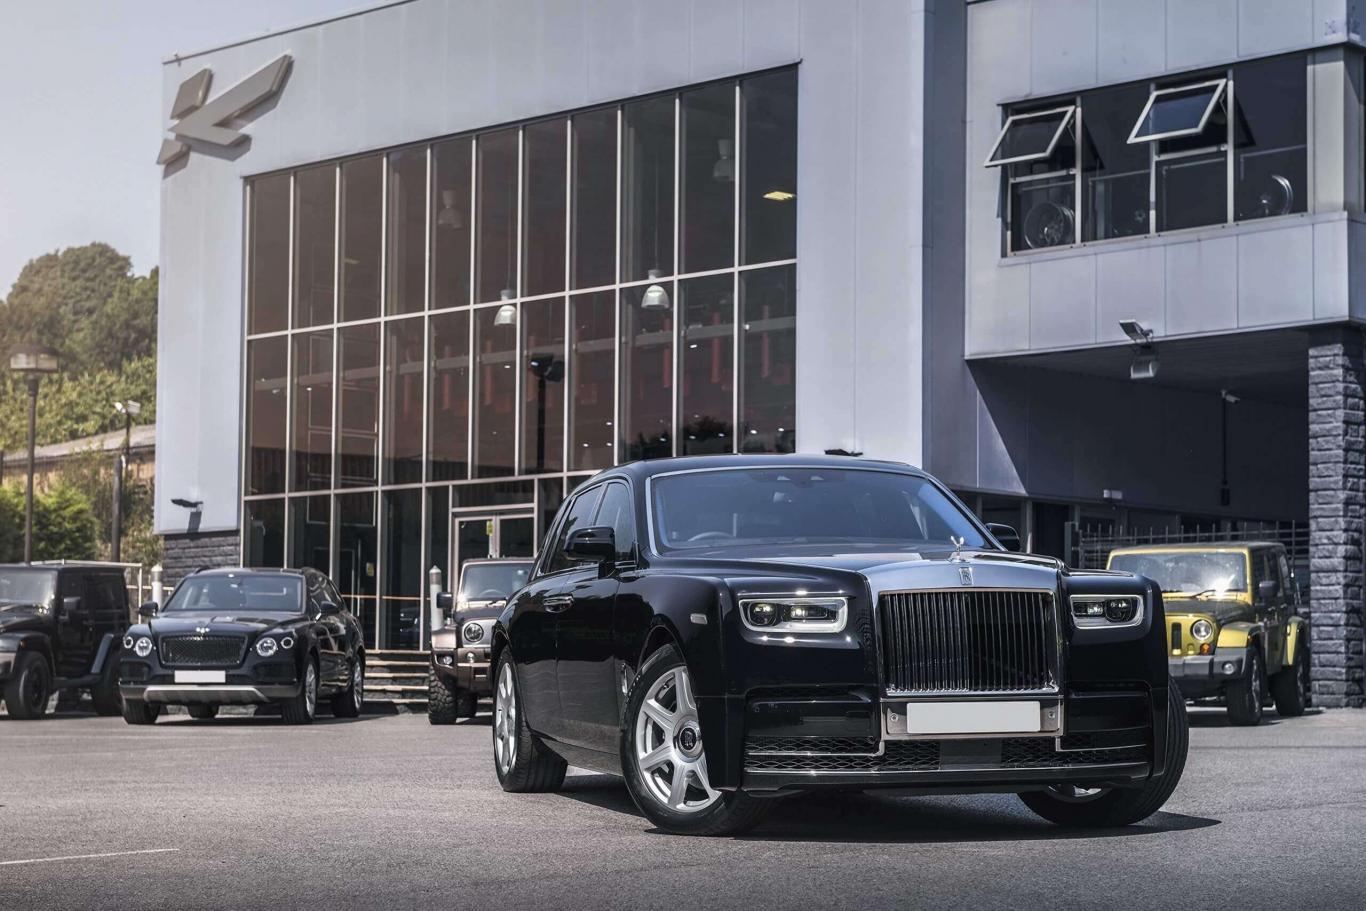 Rolls Royce Limo >> Rolls Royce Phantom Rare Collectable Limousine